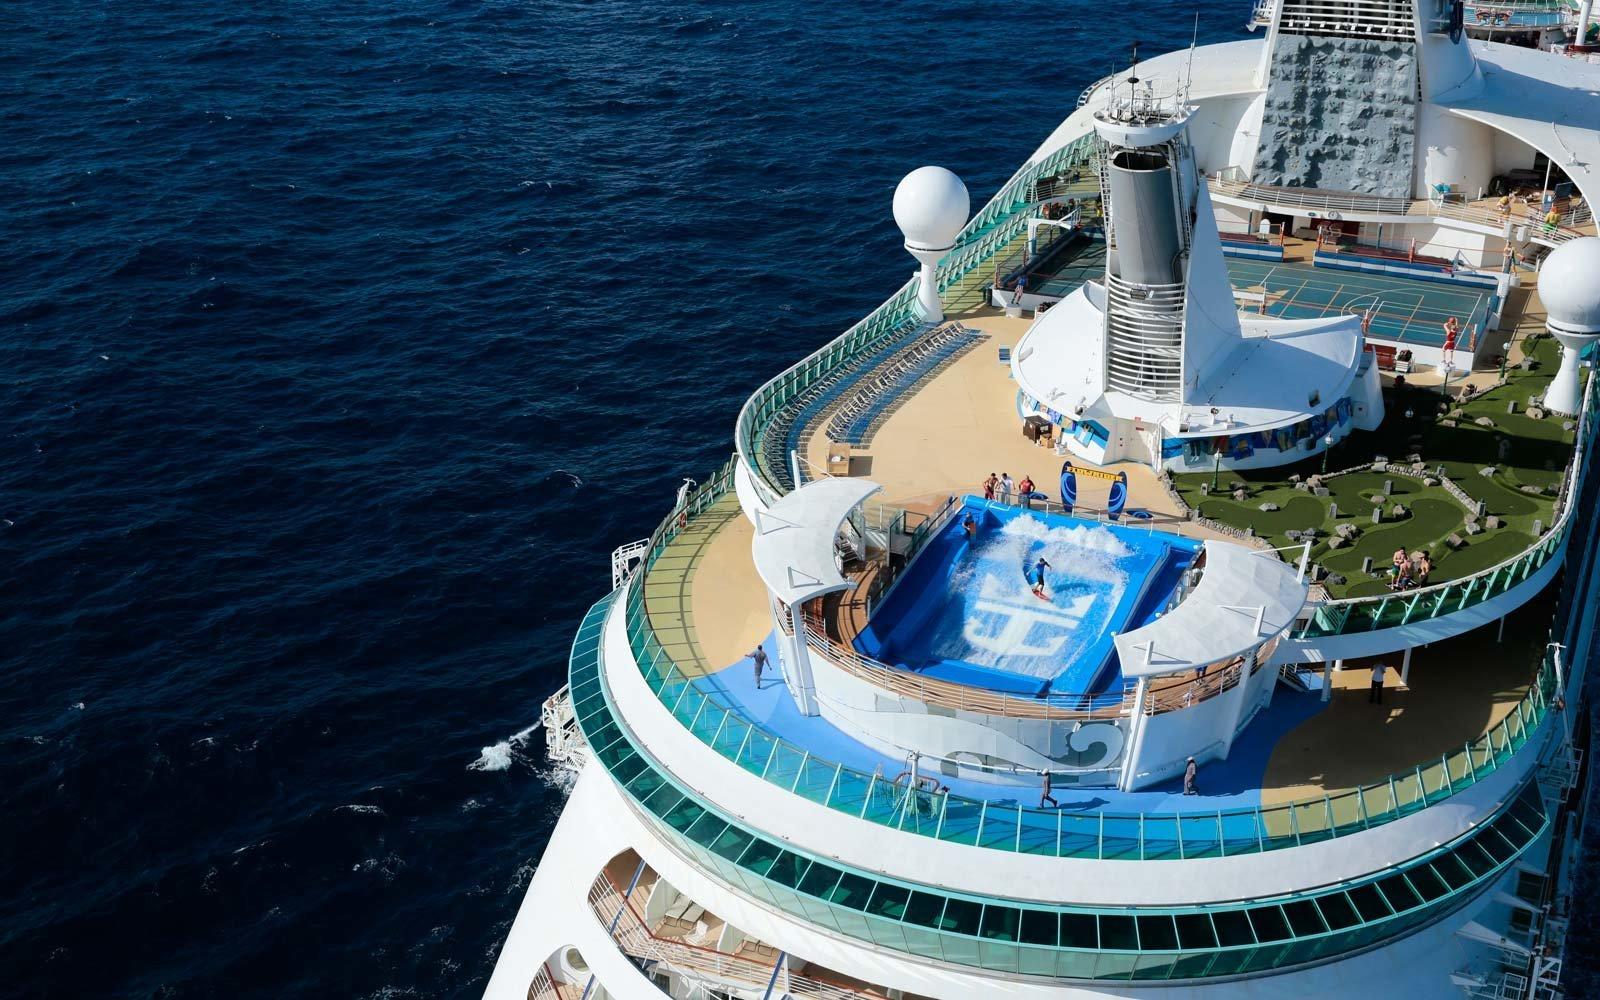 Royal Caribbean Announces New Ship Deployments For 2019 2020 Cruise Season Royal Caribbean Blog